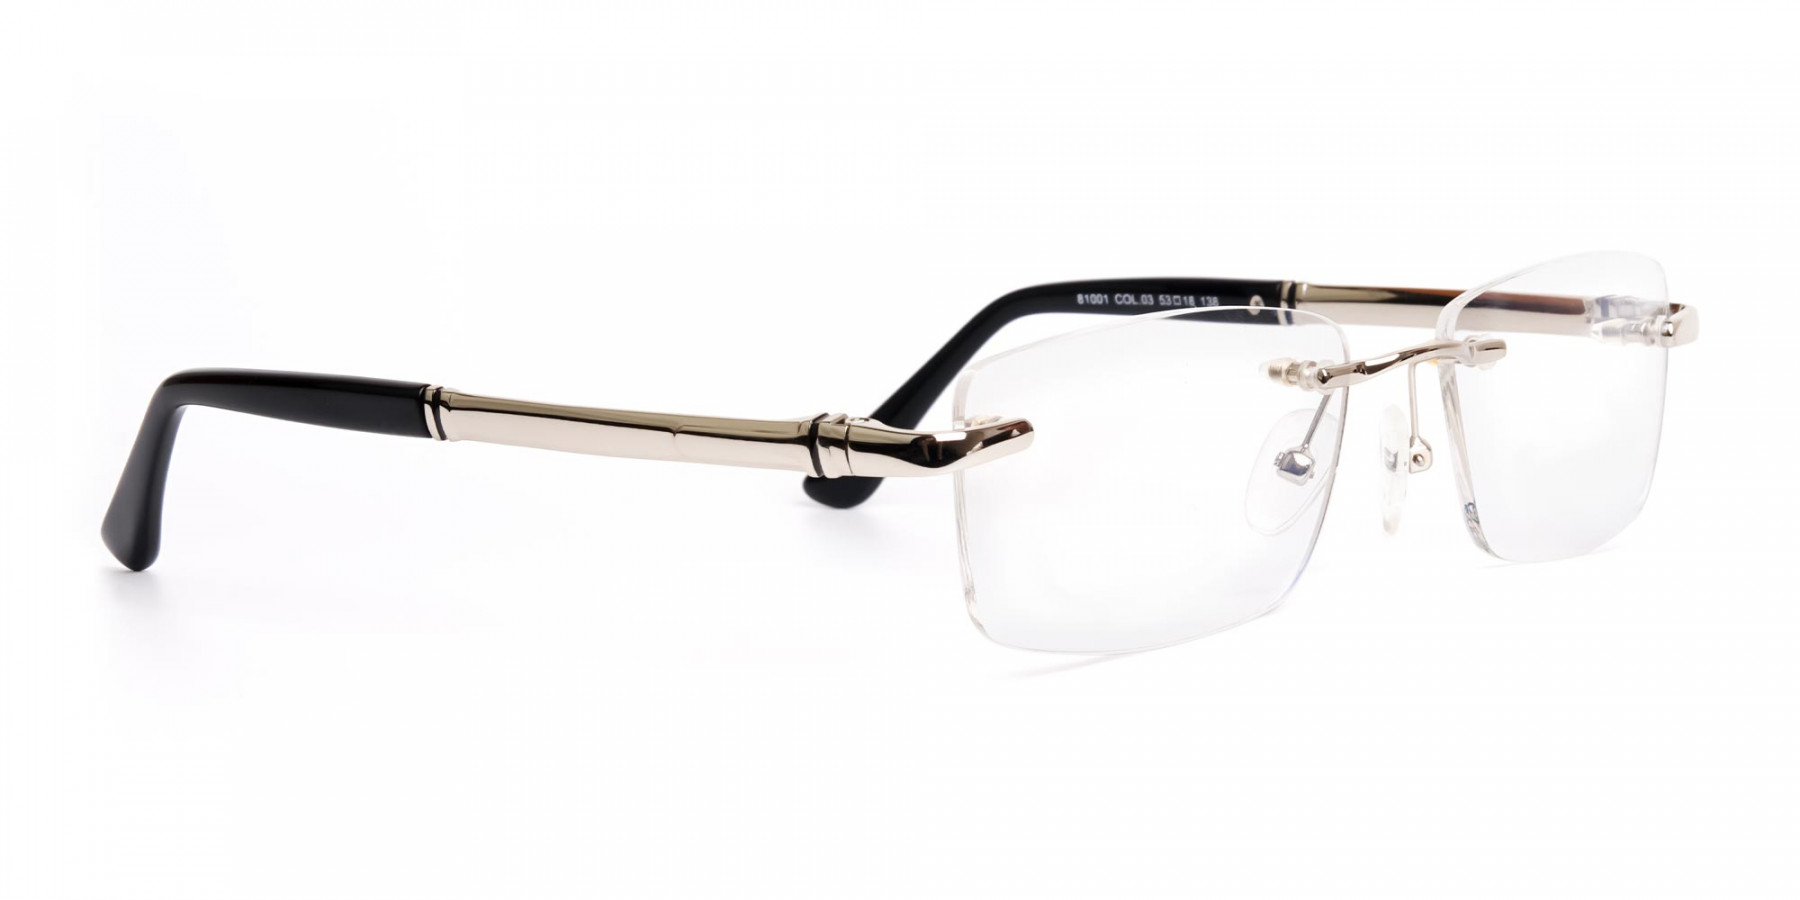 silver and black rectangular rimless glasses frames-1